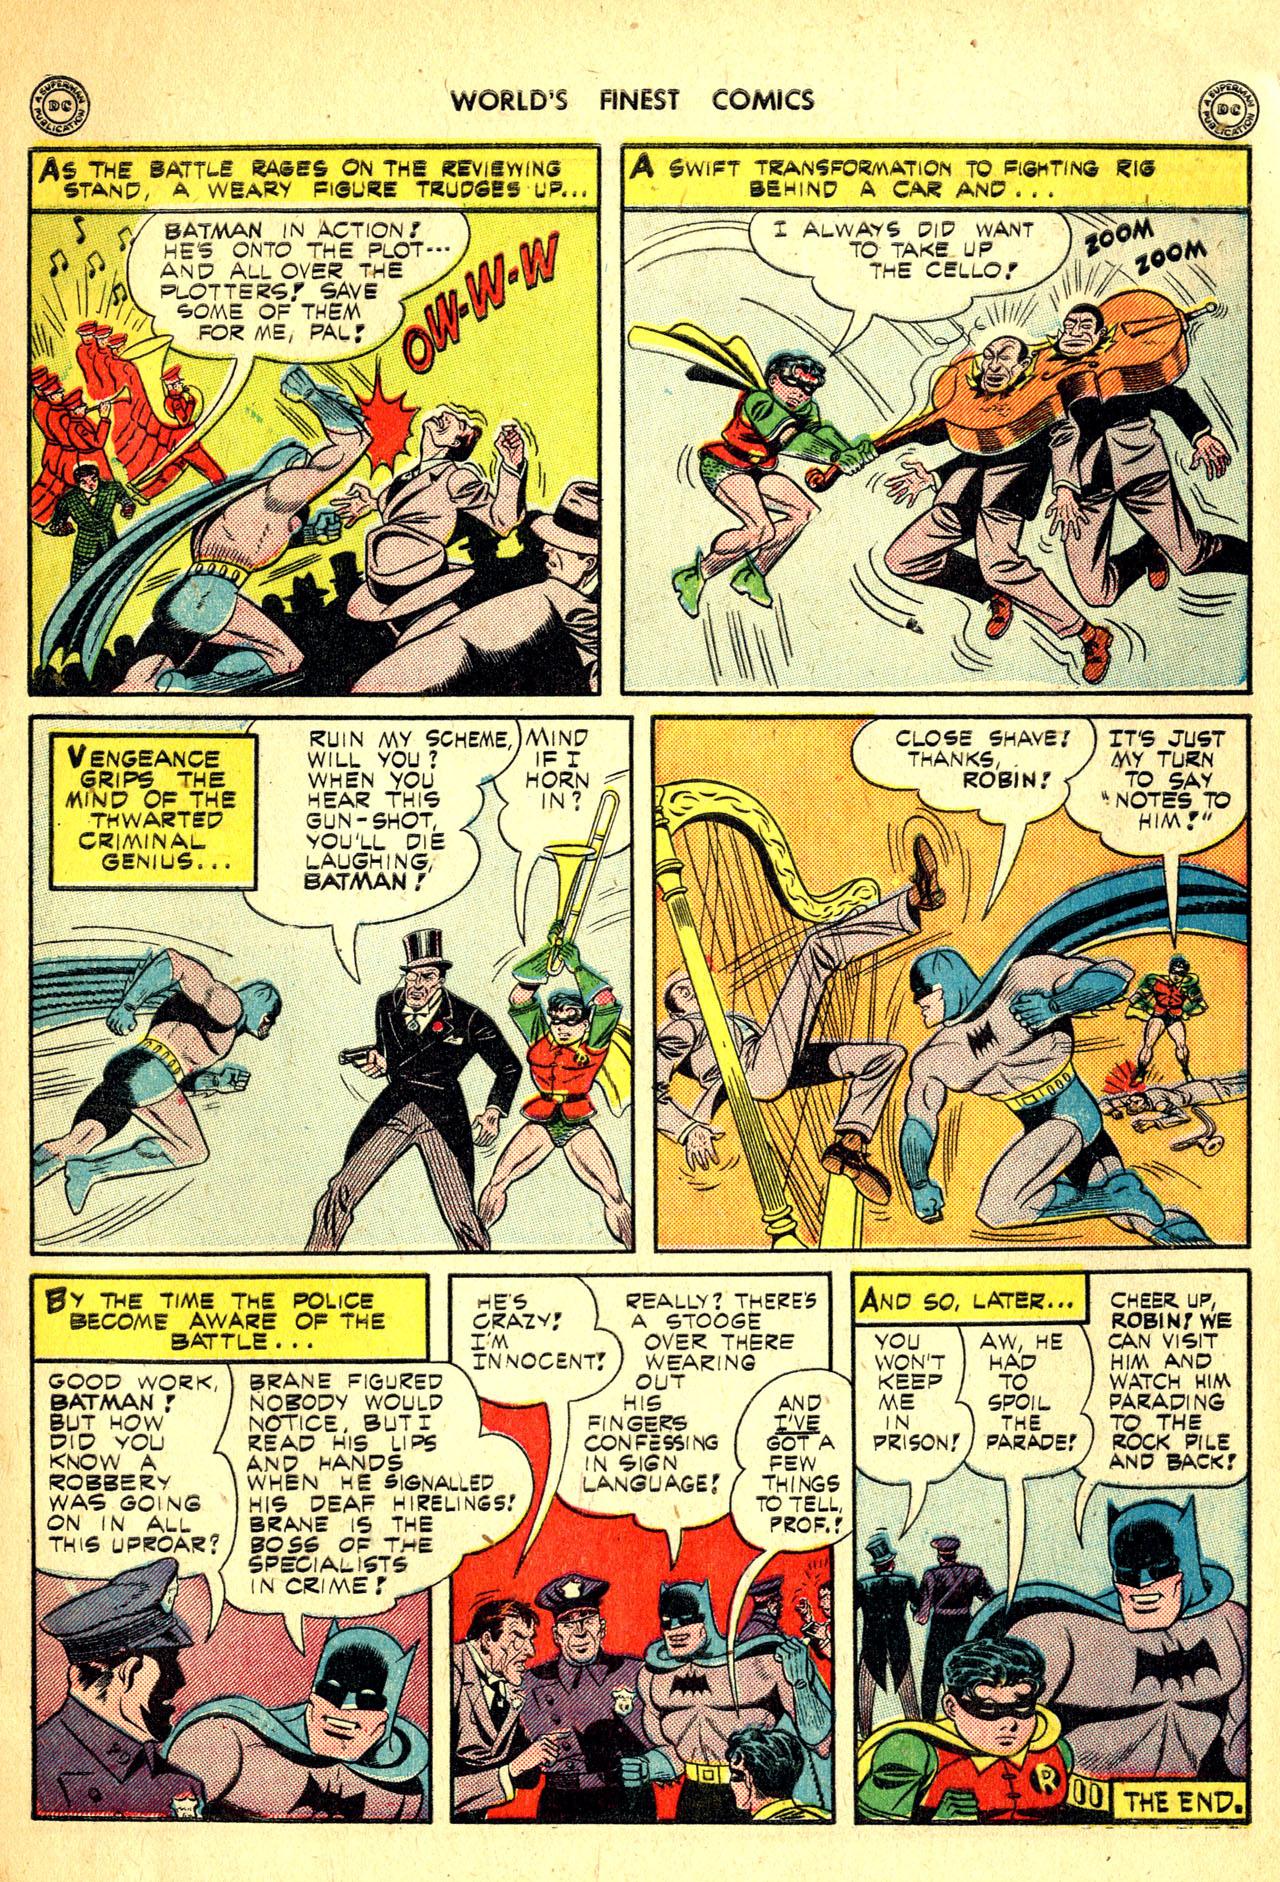 Read online World's Finest Comics comic -  Issue #18 - 81